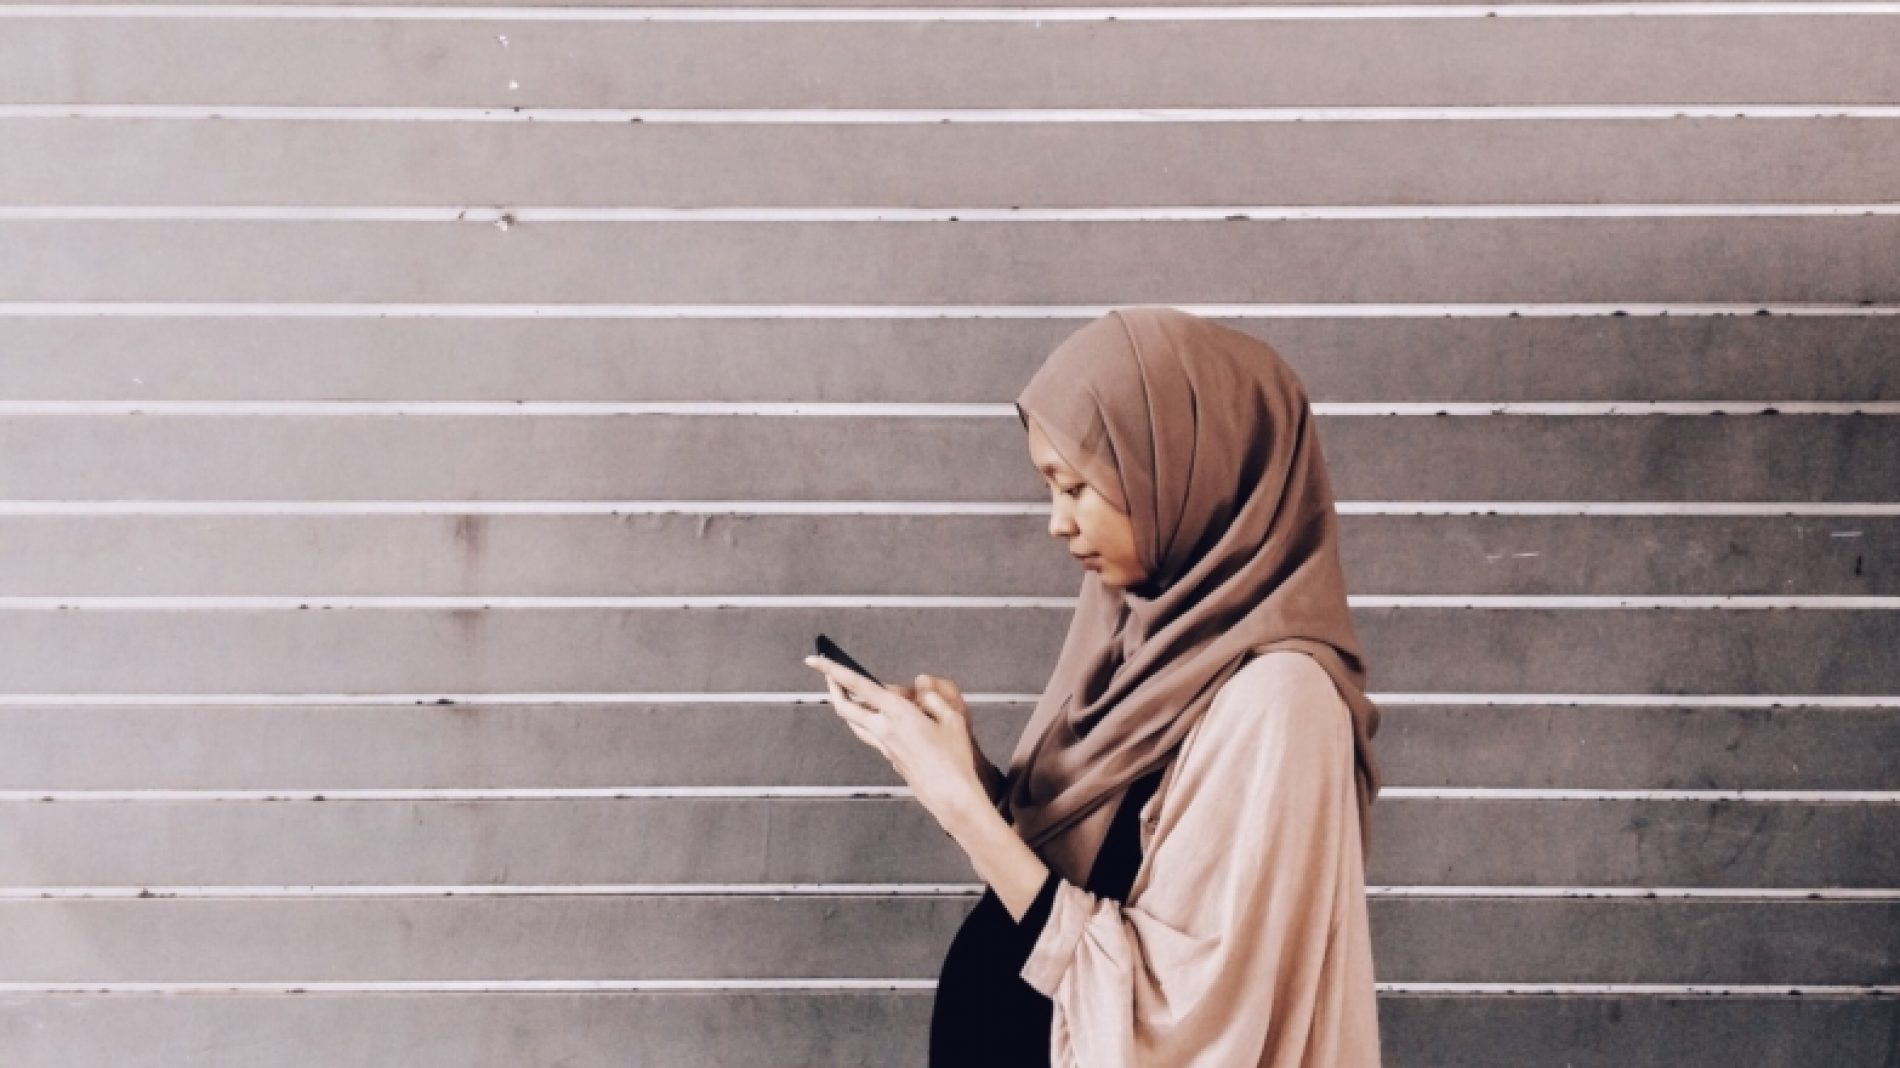 muslim-girl-on-phone-T1YHZf